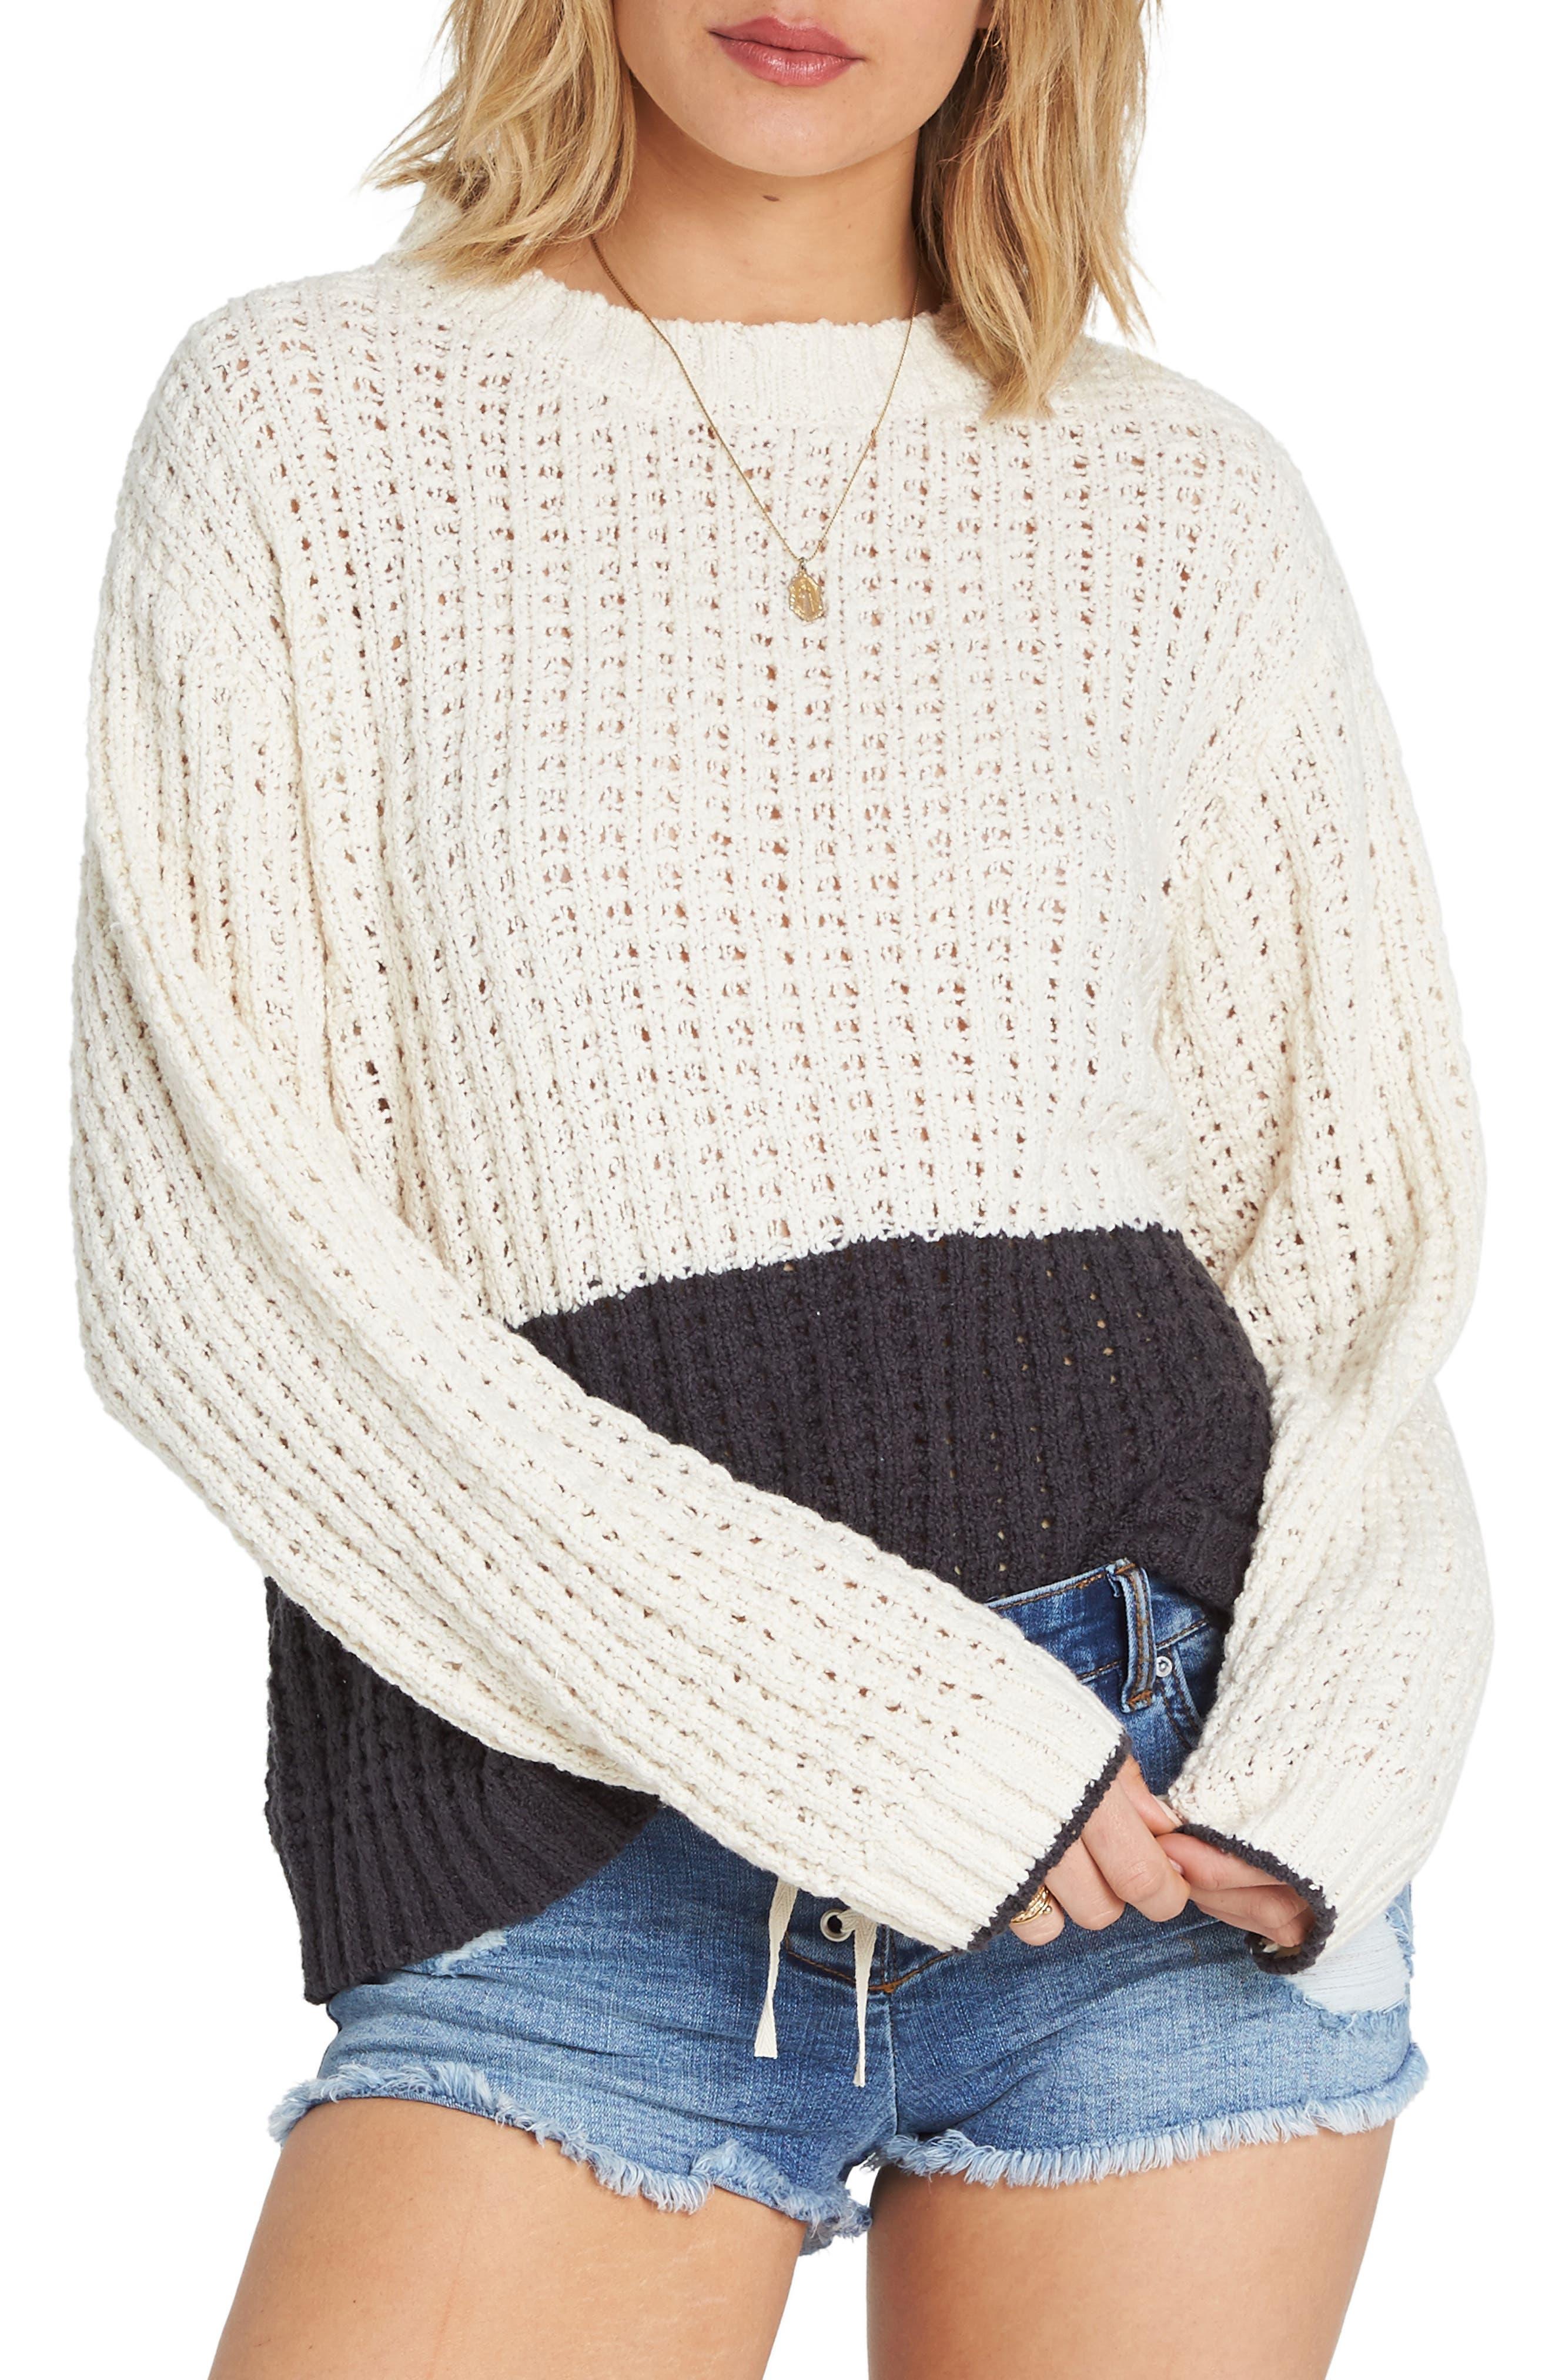 BILLABONG, Block Party Colorblock Sweater, Main thumbnail 1, color, 001